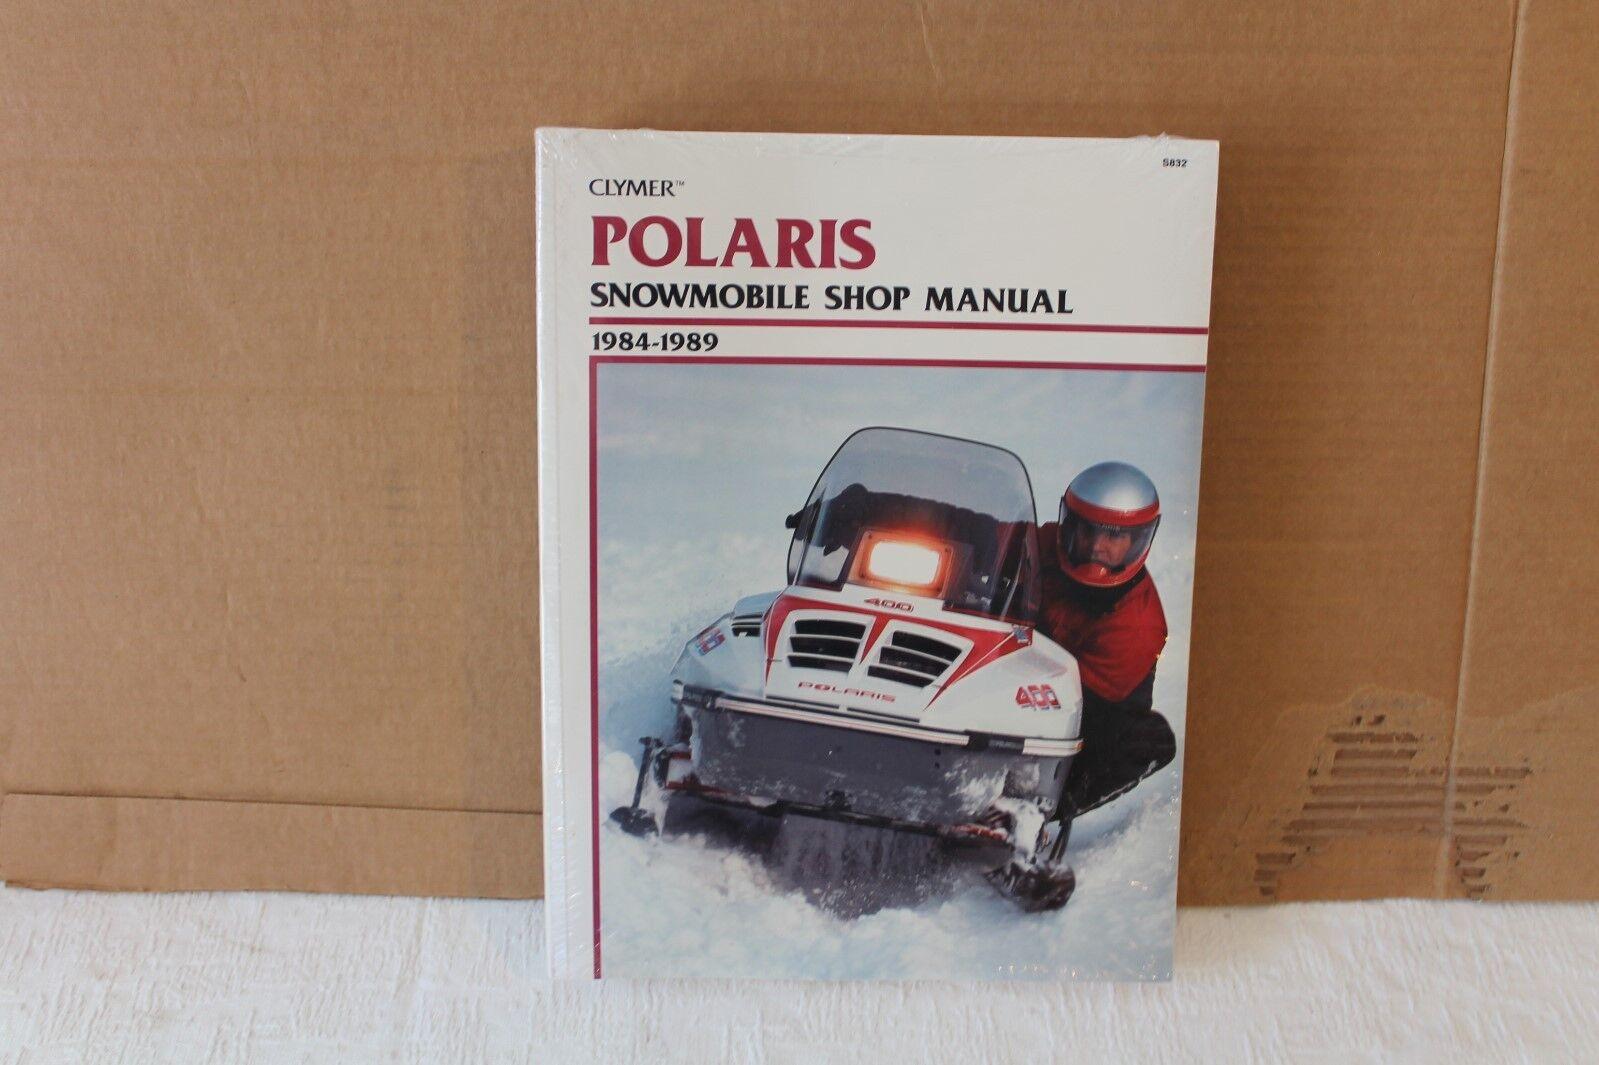 clymer repair manual s832 polaris snowmobile ebay rh ebay com Polaris 650 Triple Snowmobile Wiring-Diagram Polaris 650 Triple Snowmobile Wiring-Diagram